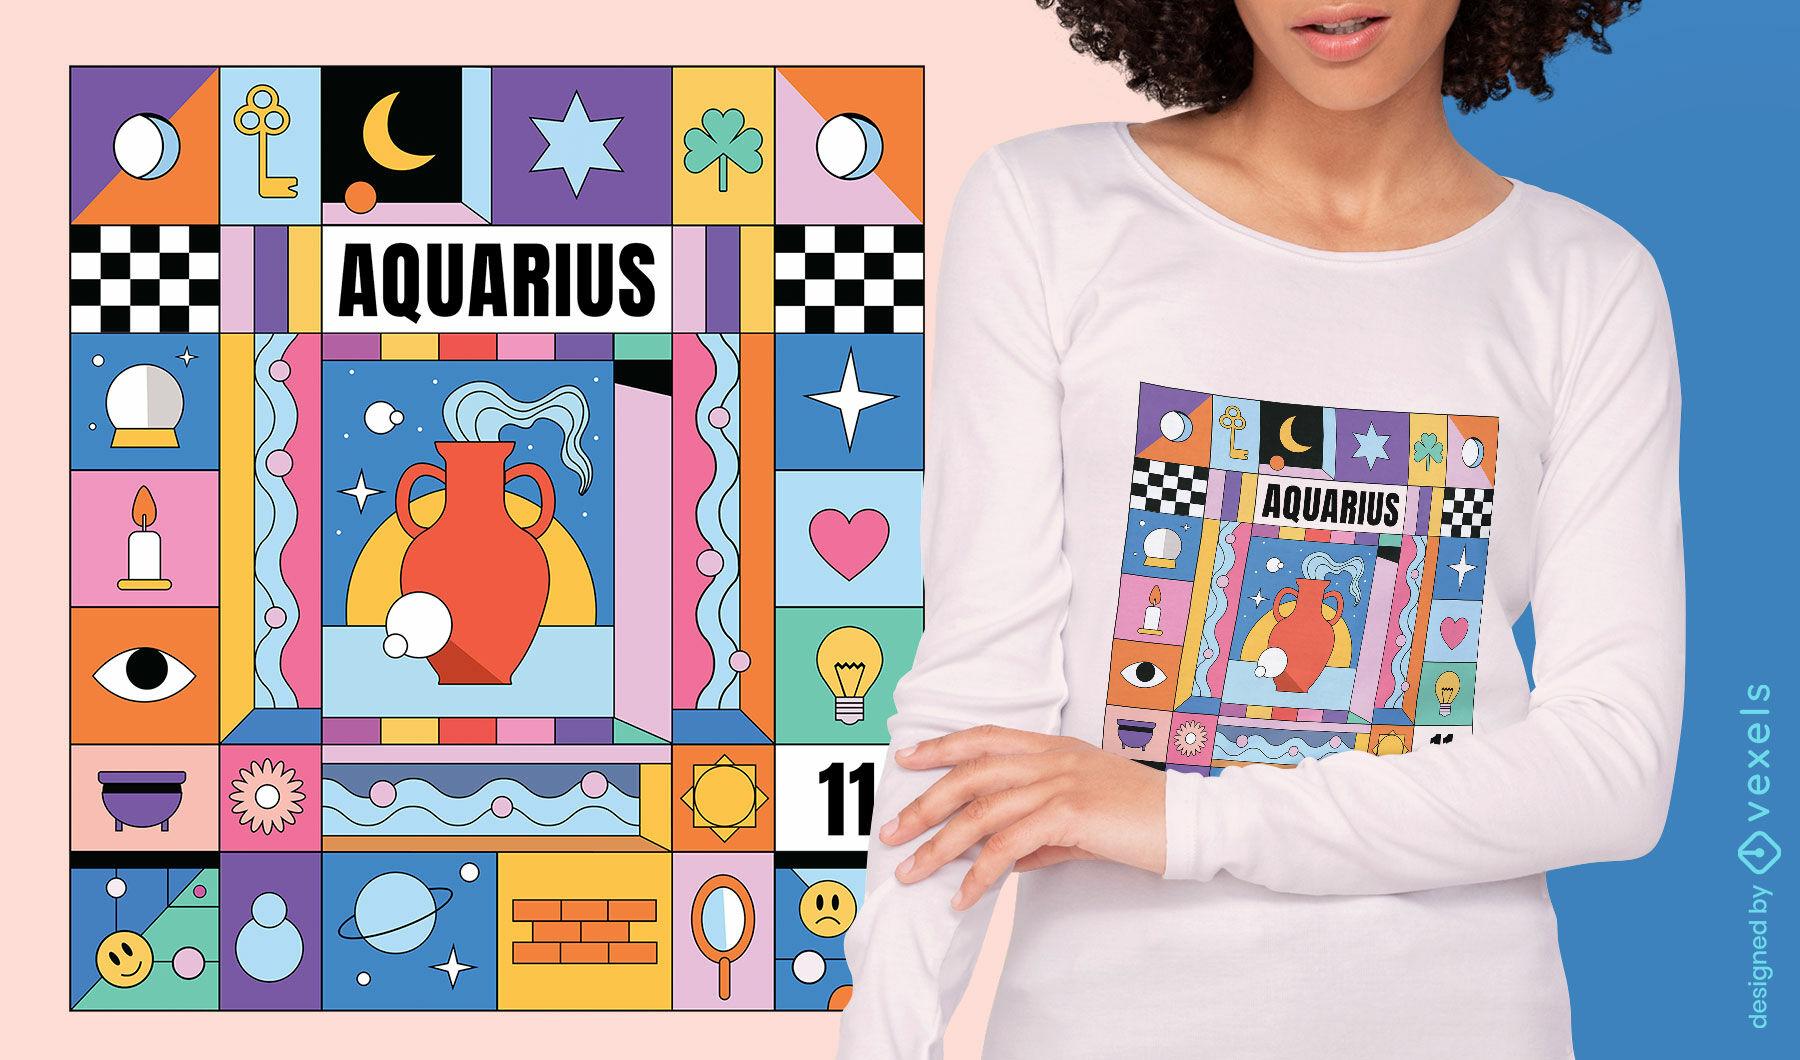 Aquarius colorful zodiac sign t-shirt design